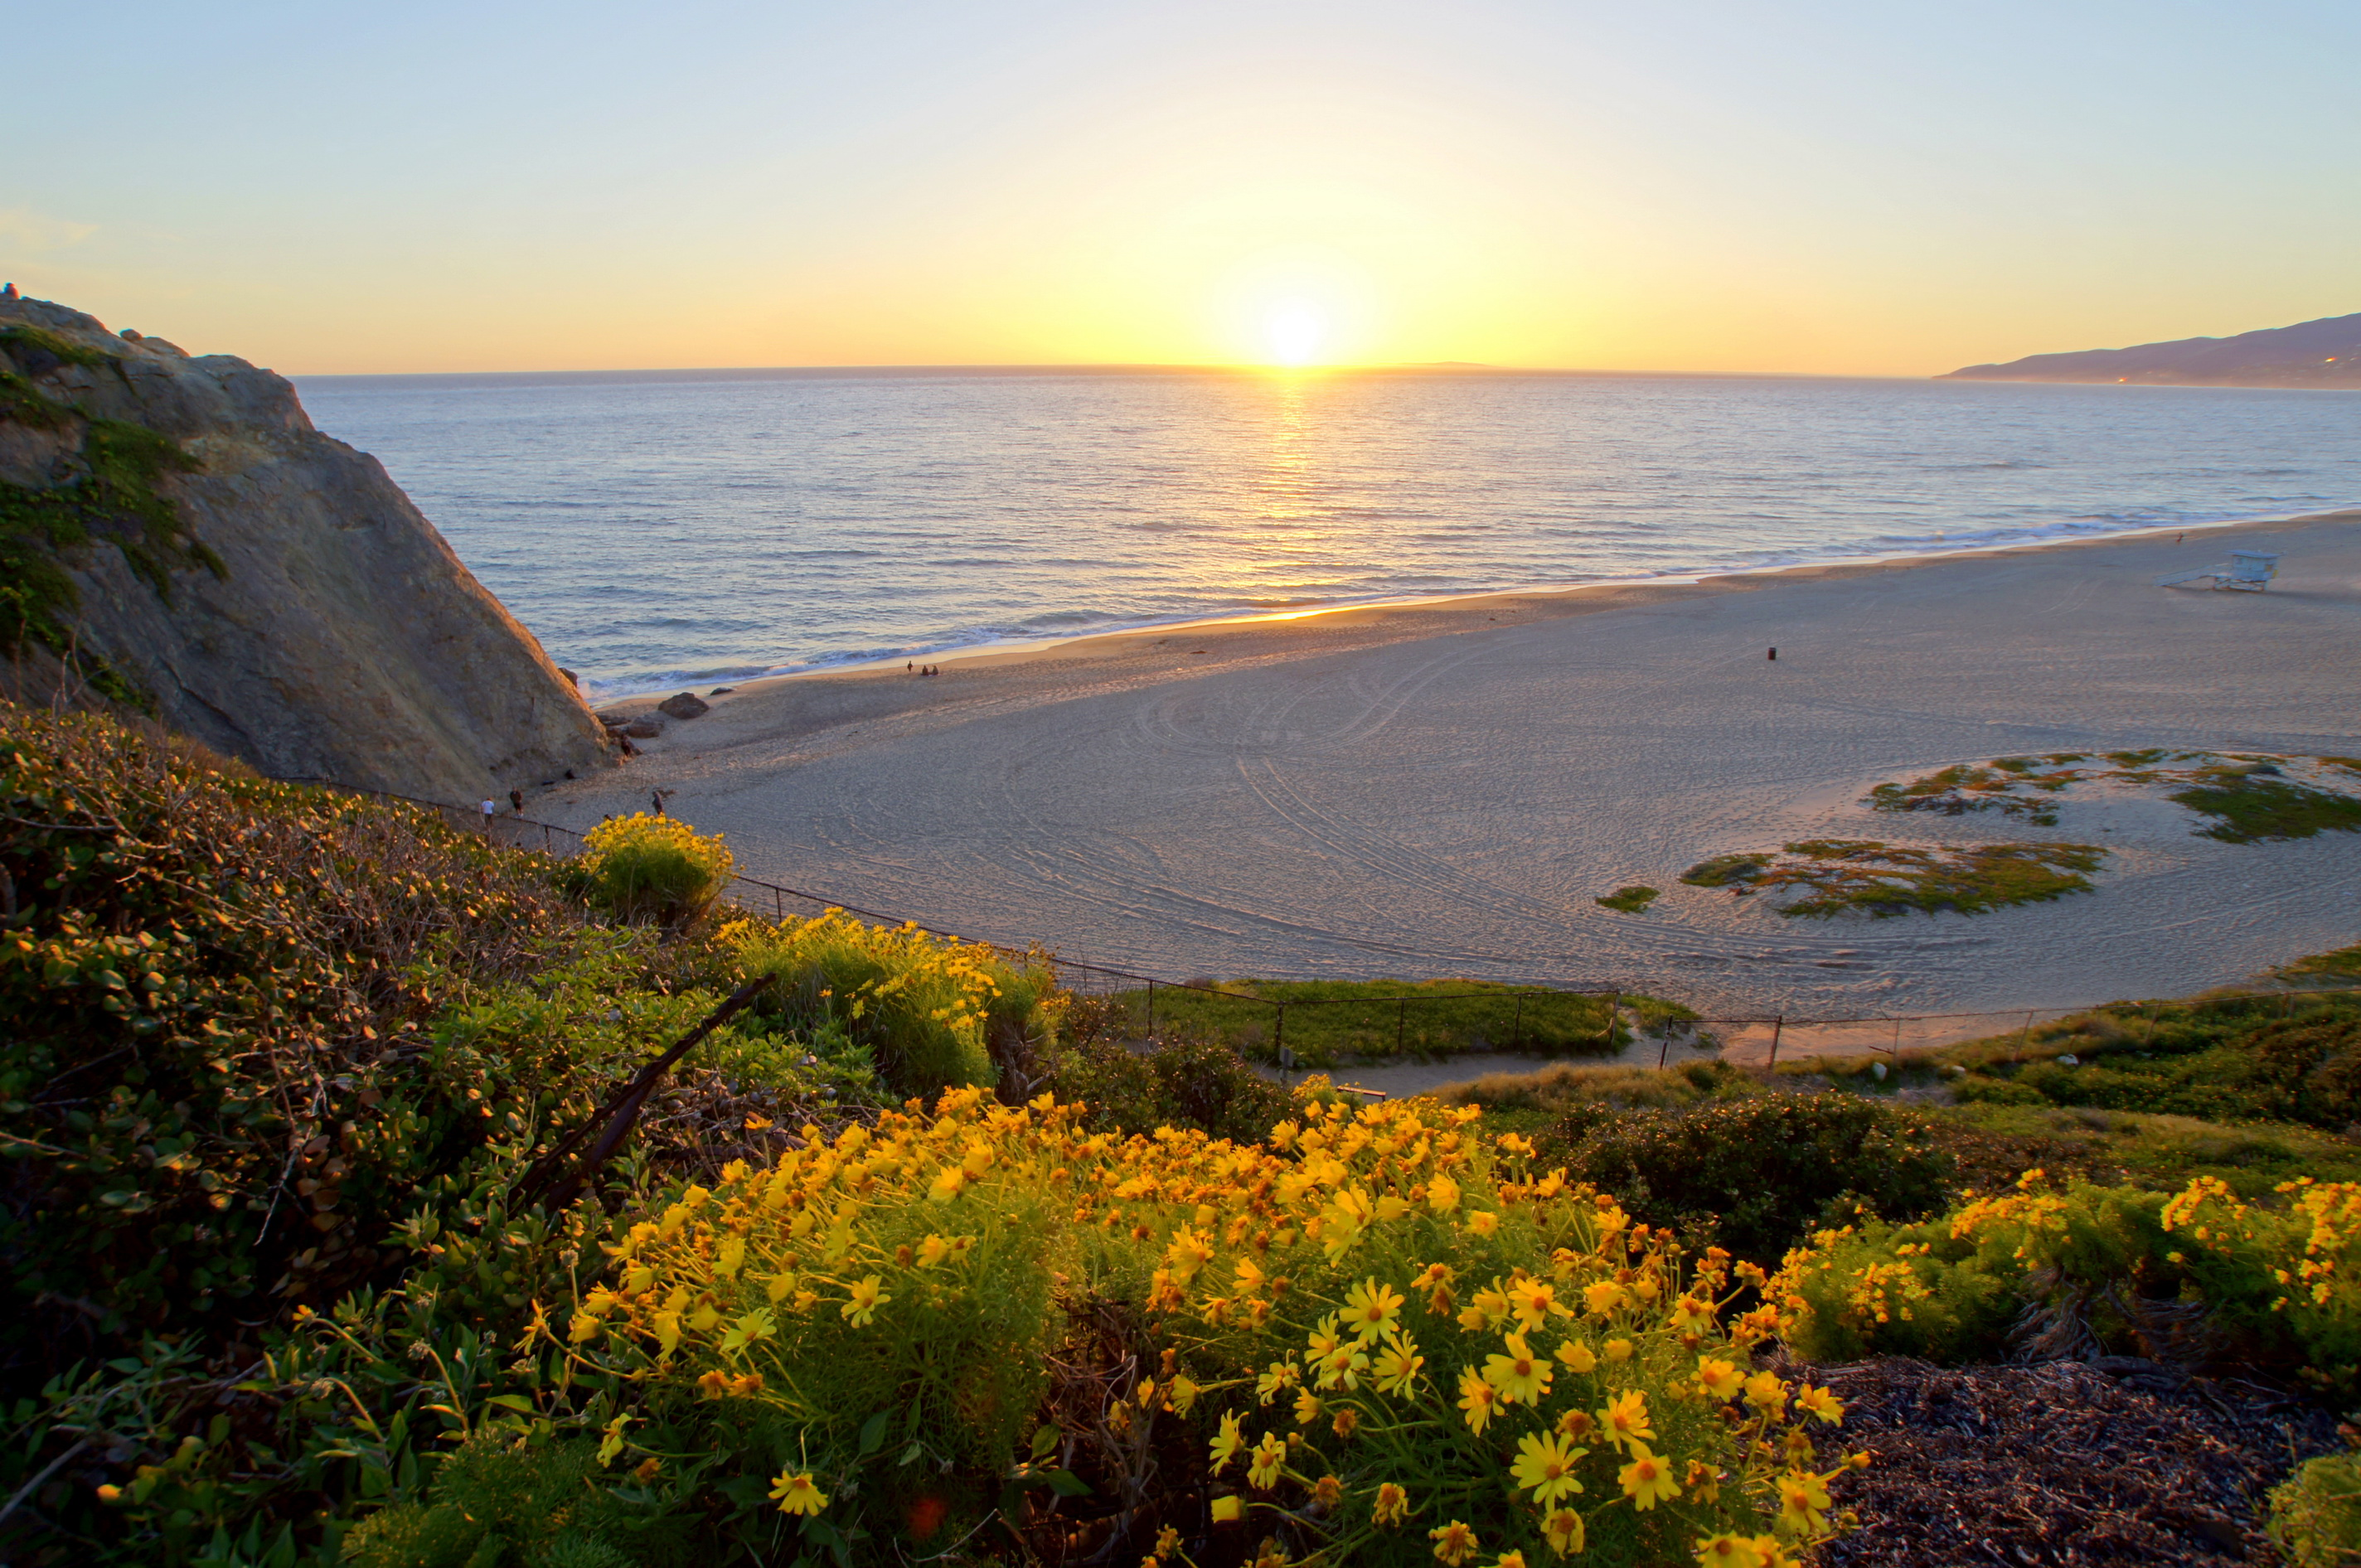 Coast Sea Sunrises and sunsets Beach Horizon California Malibu Nature Flowers